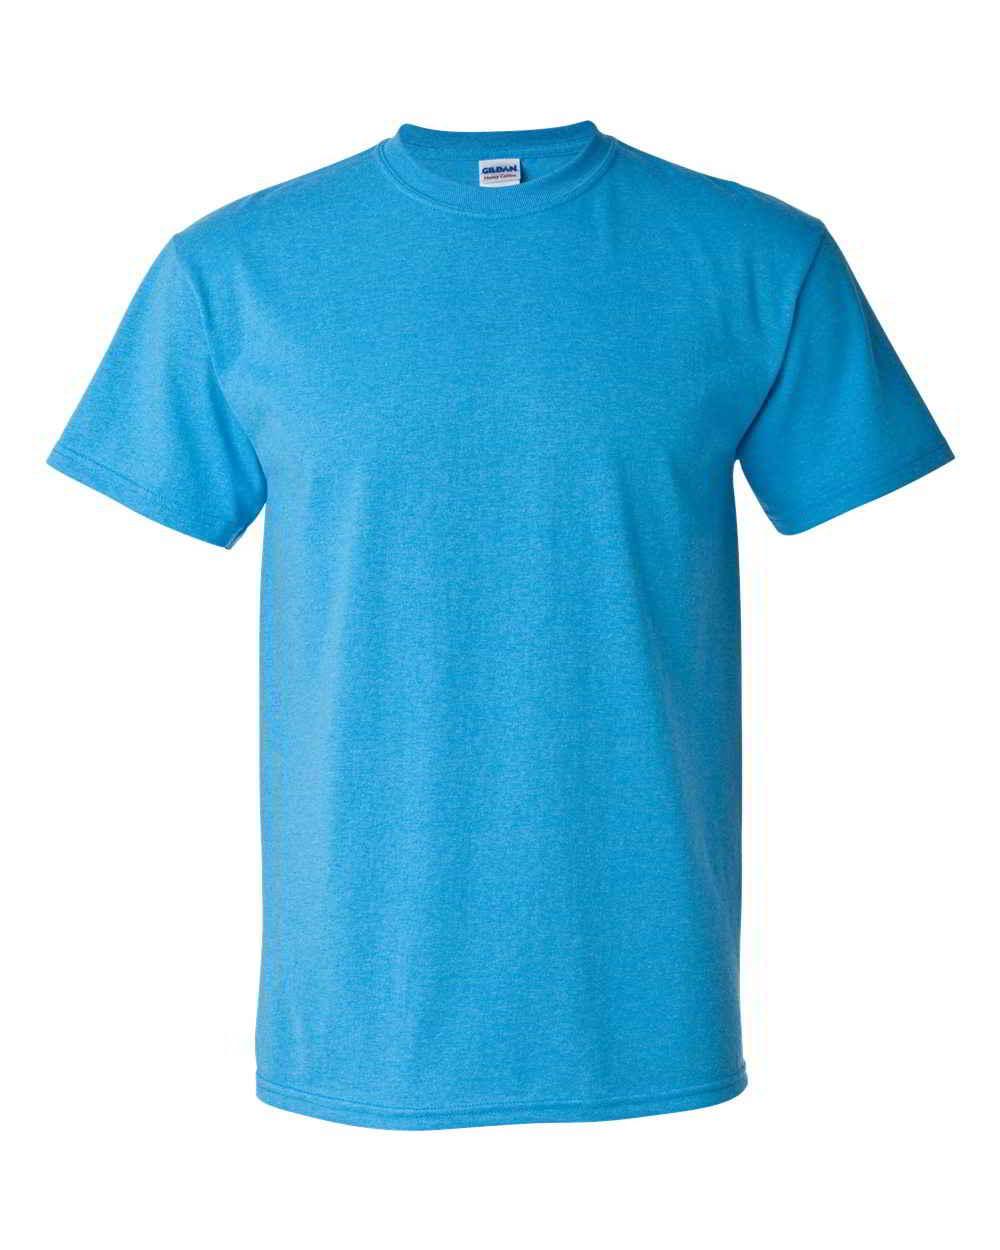 Gildan-Heavy-Cotton-Short-Sleeve-Mens-Blue-T-Shirts-5000 thumbnail 12